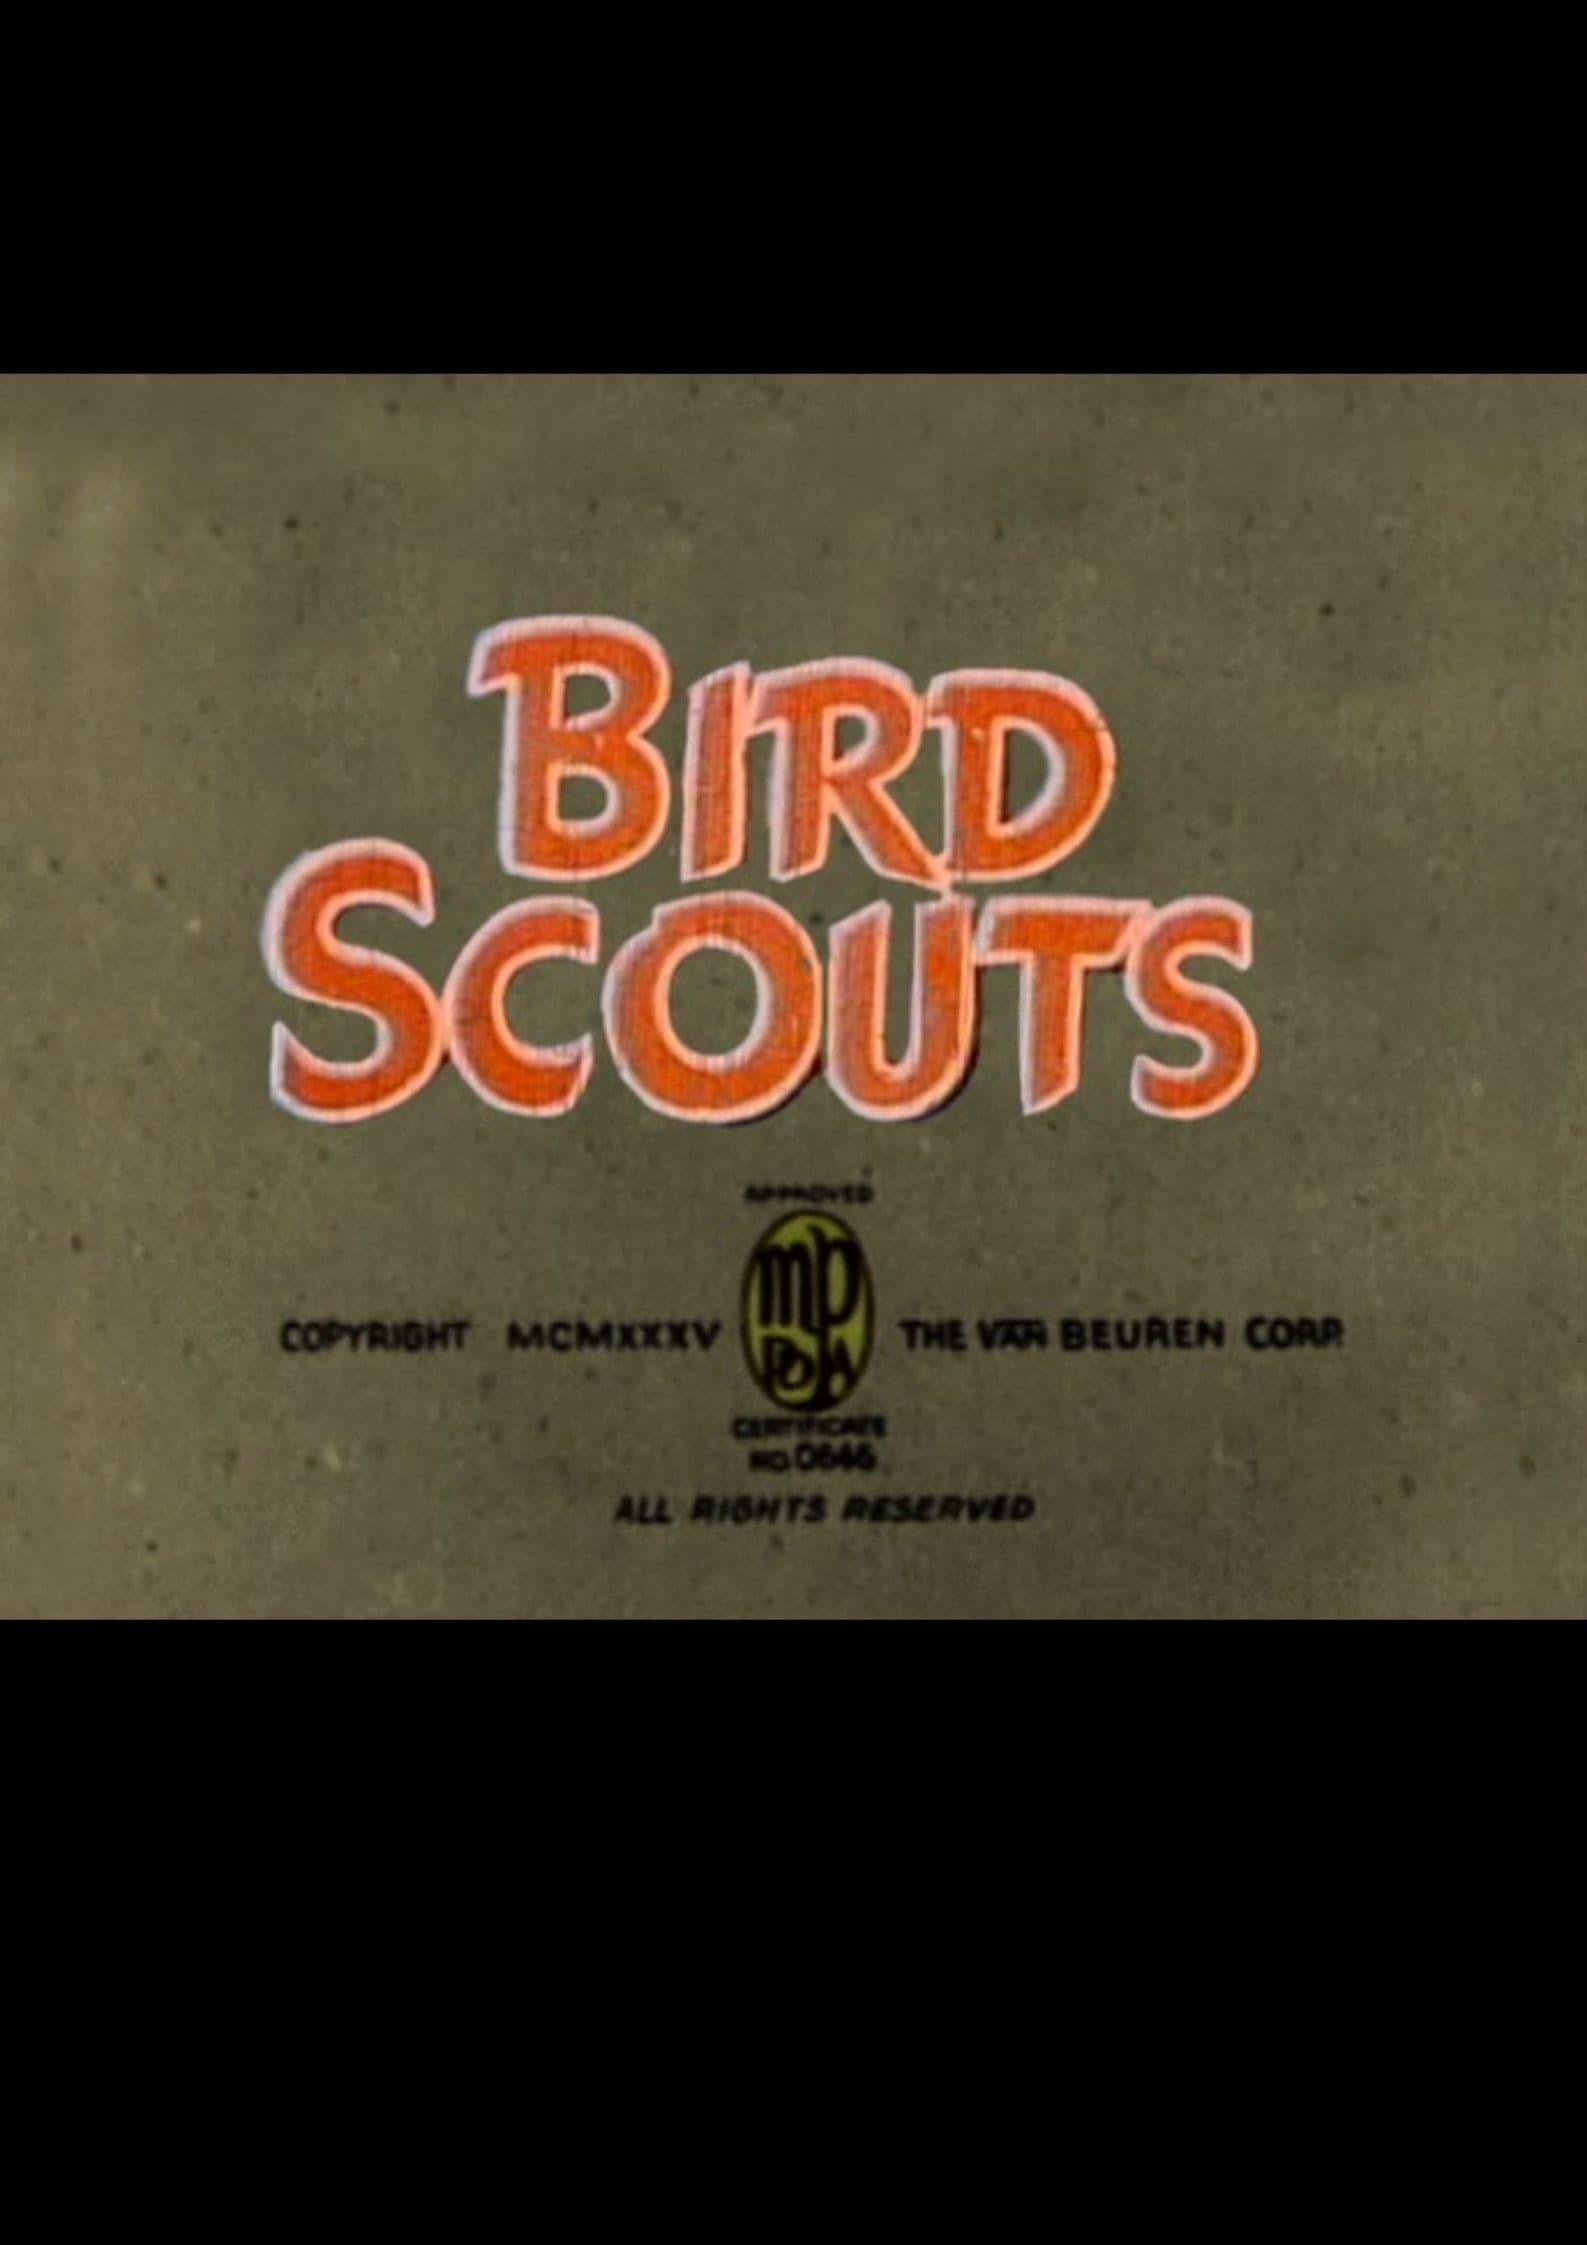 Bird Scouts